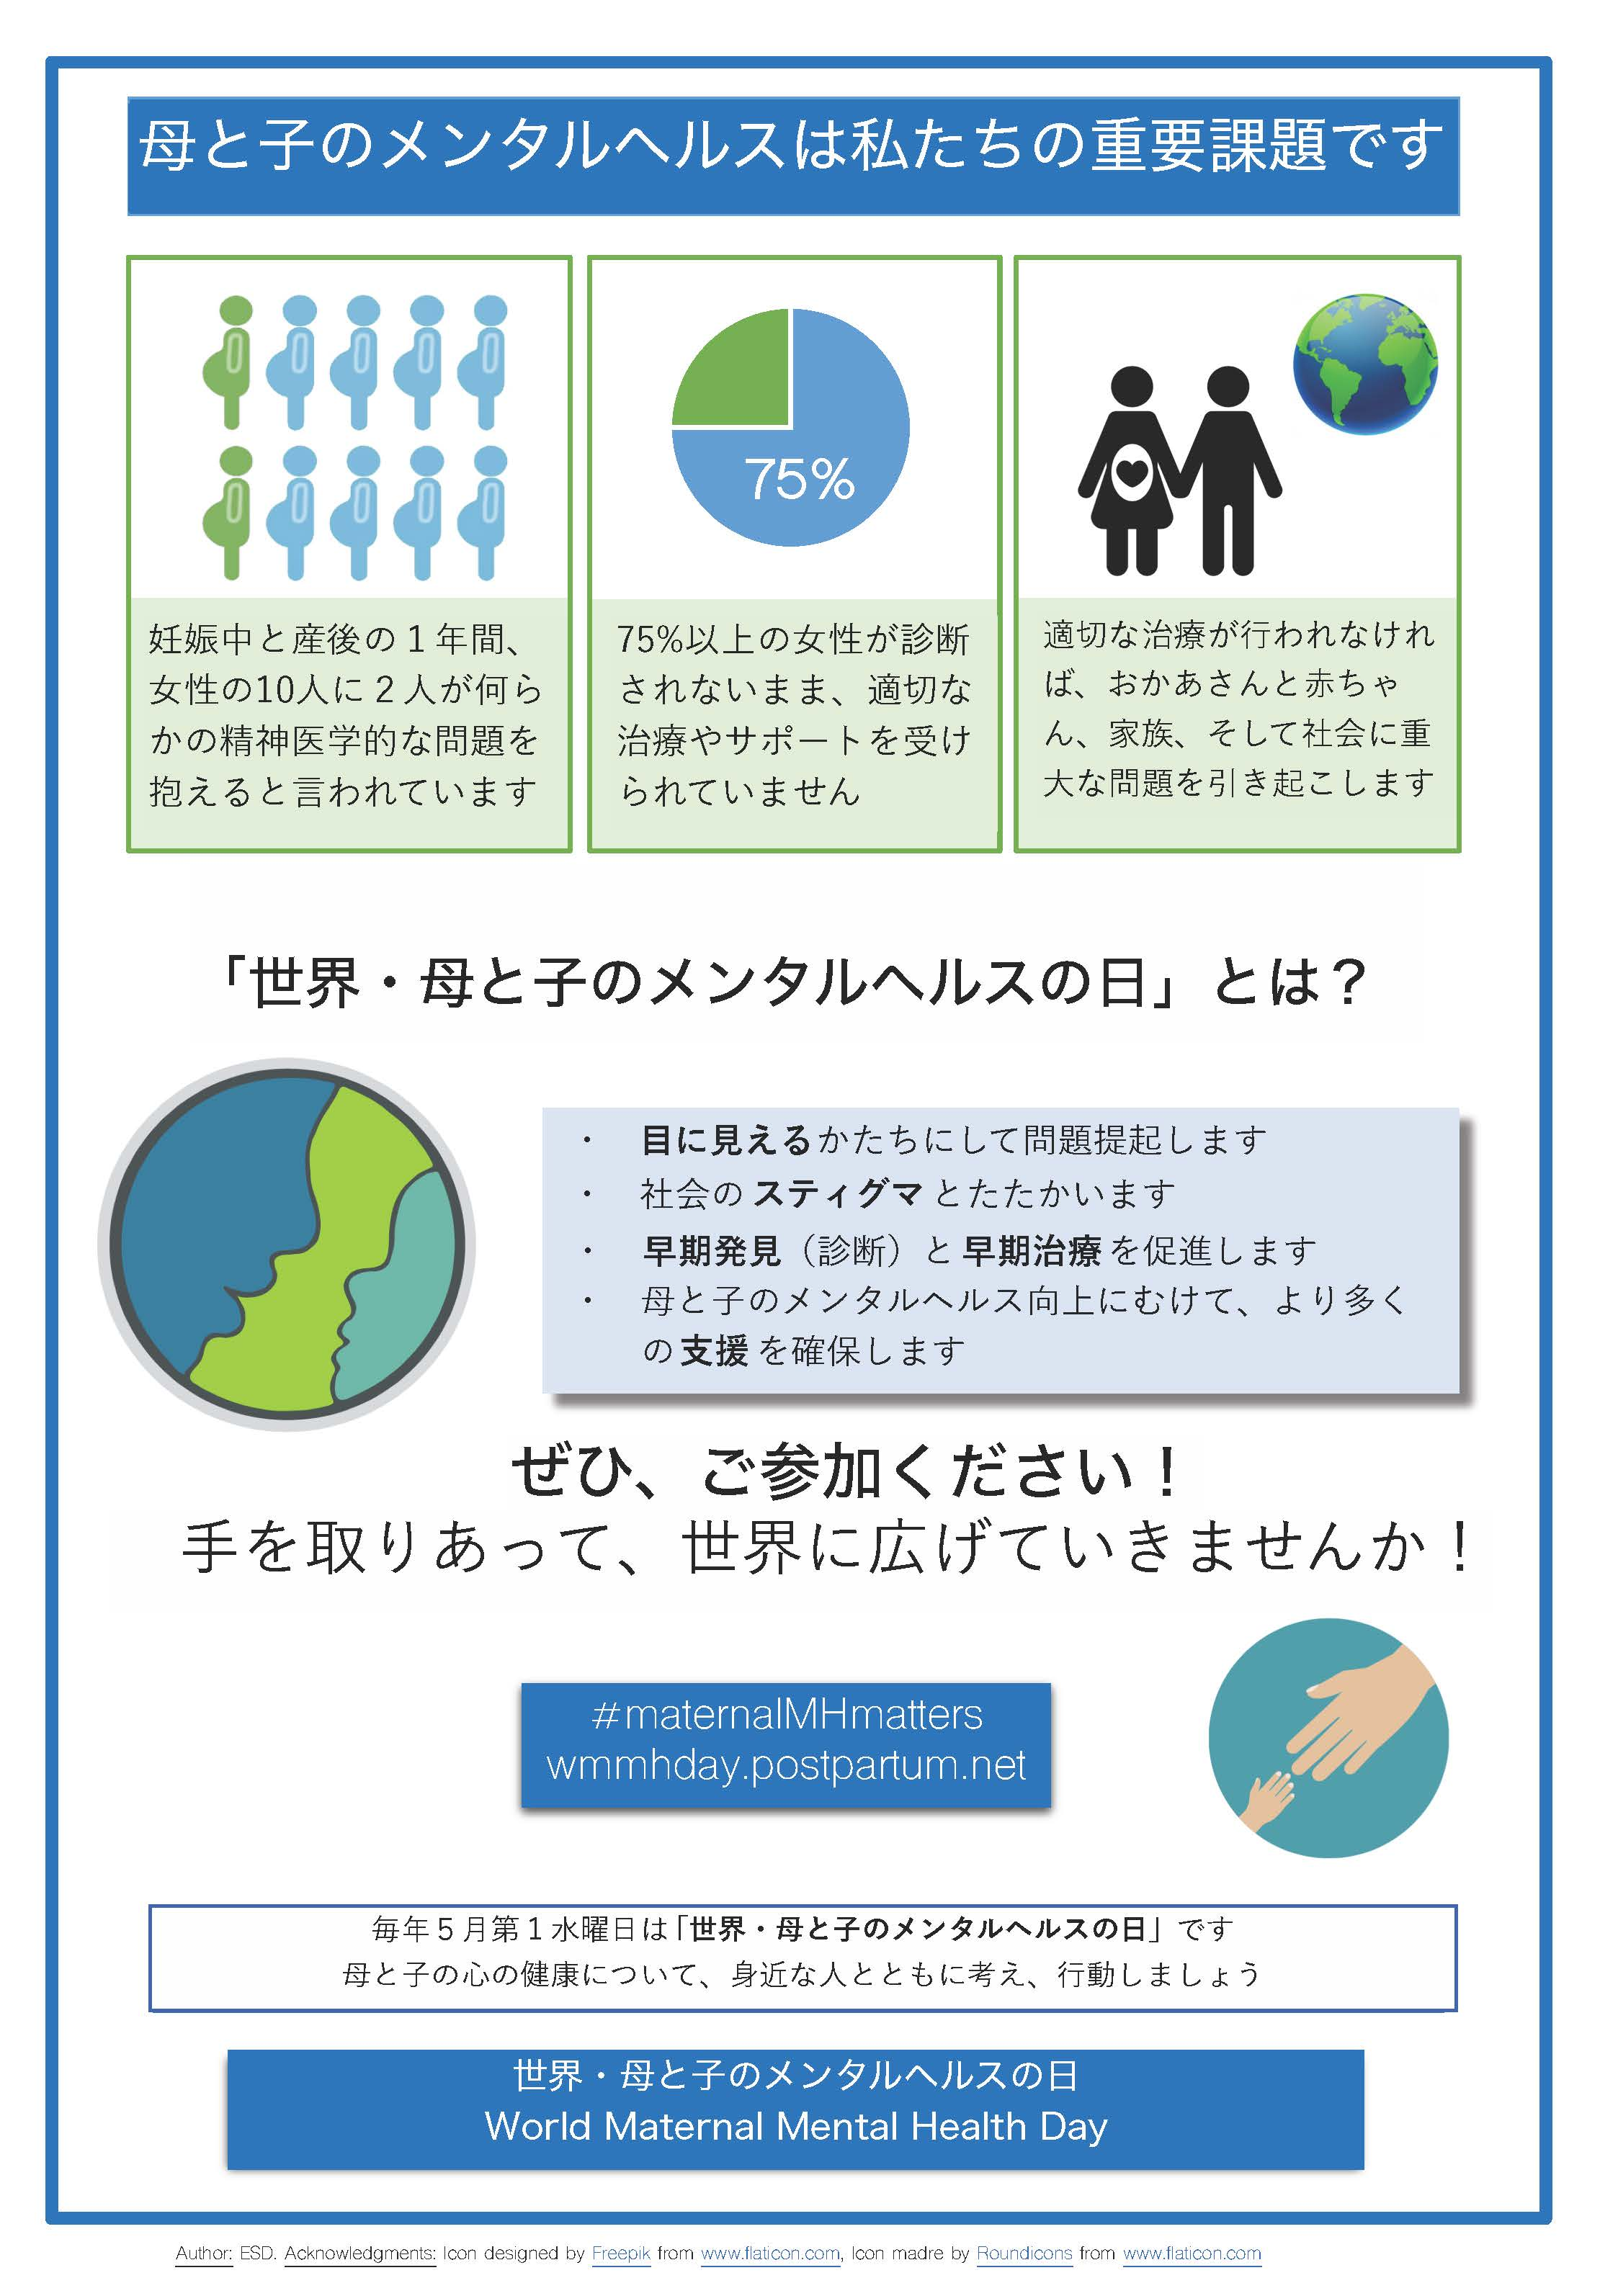 WMMHday_infographic_japanese - WMMH Day